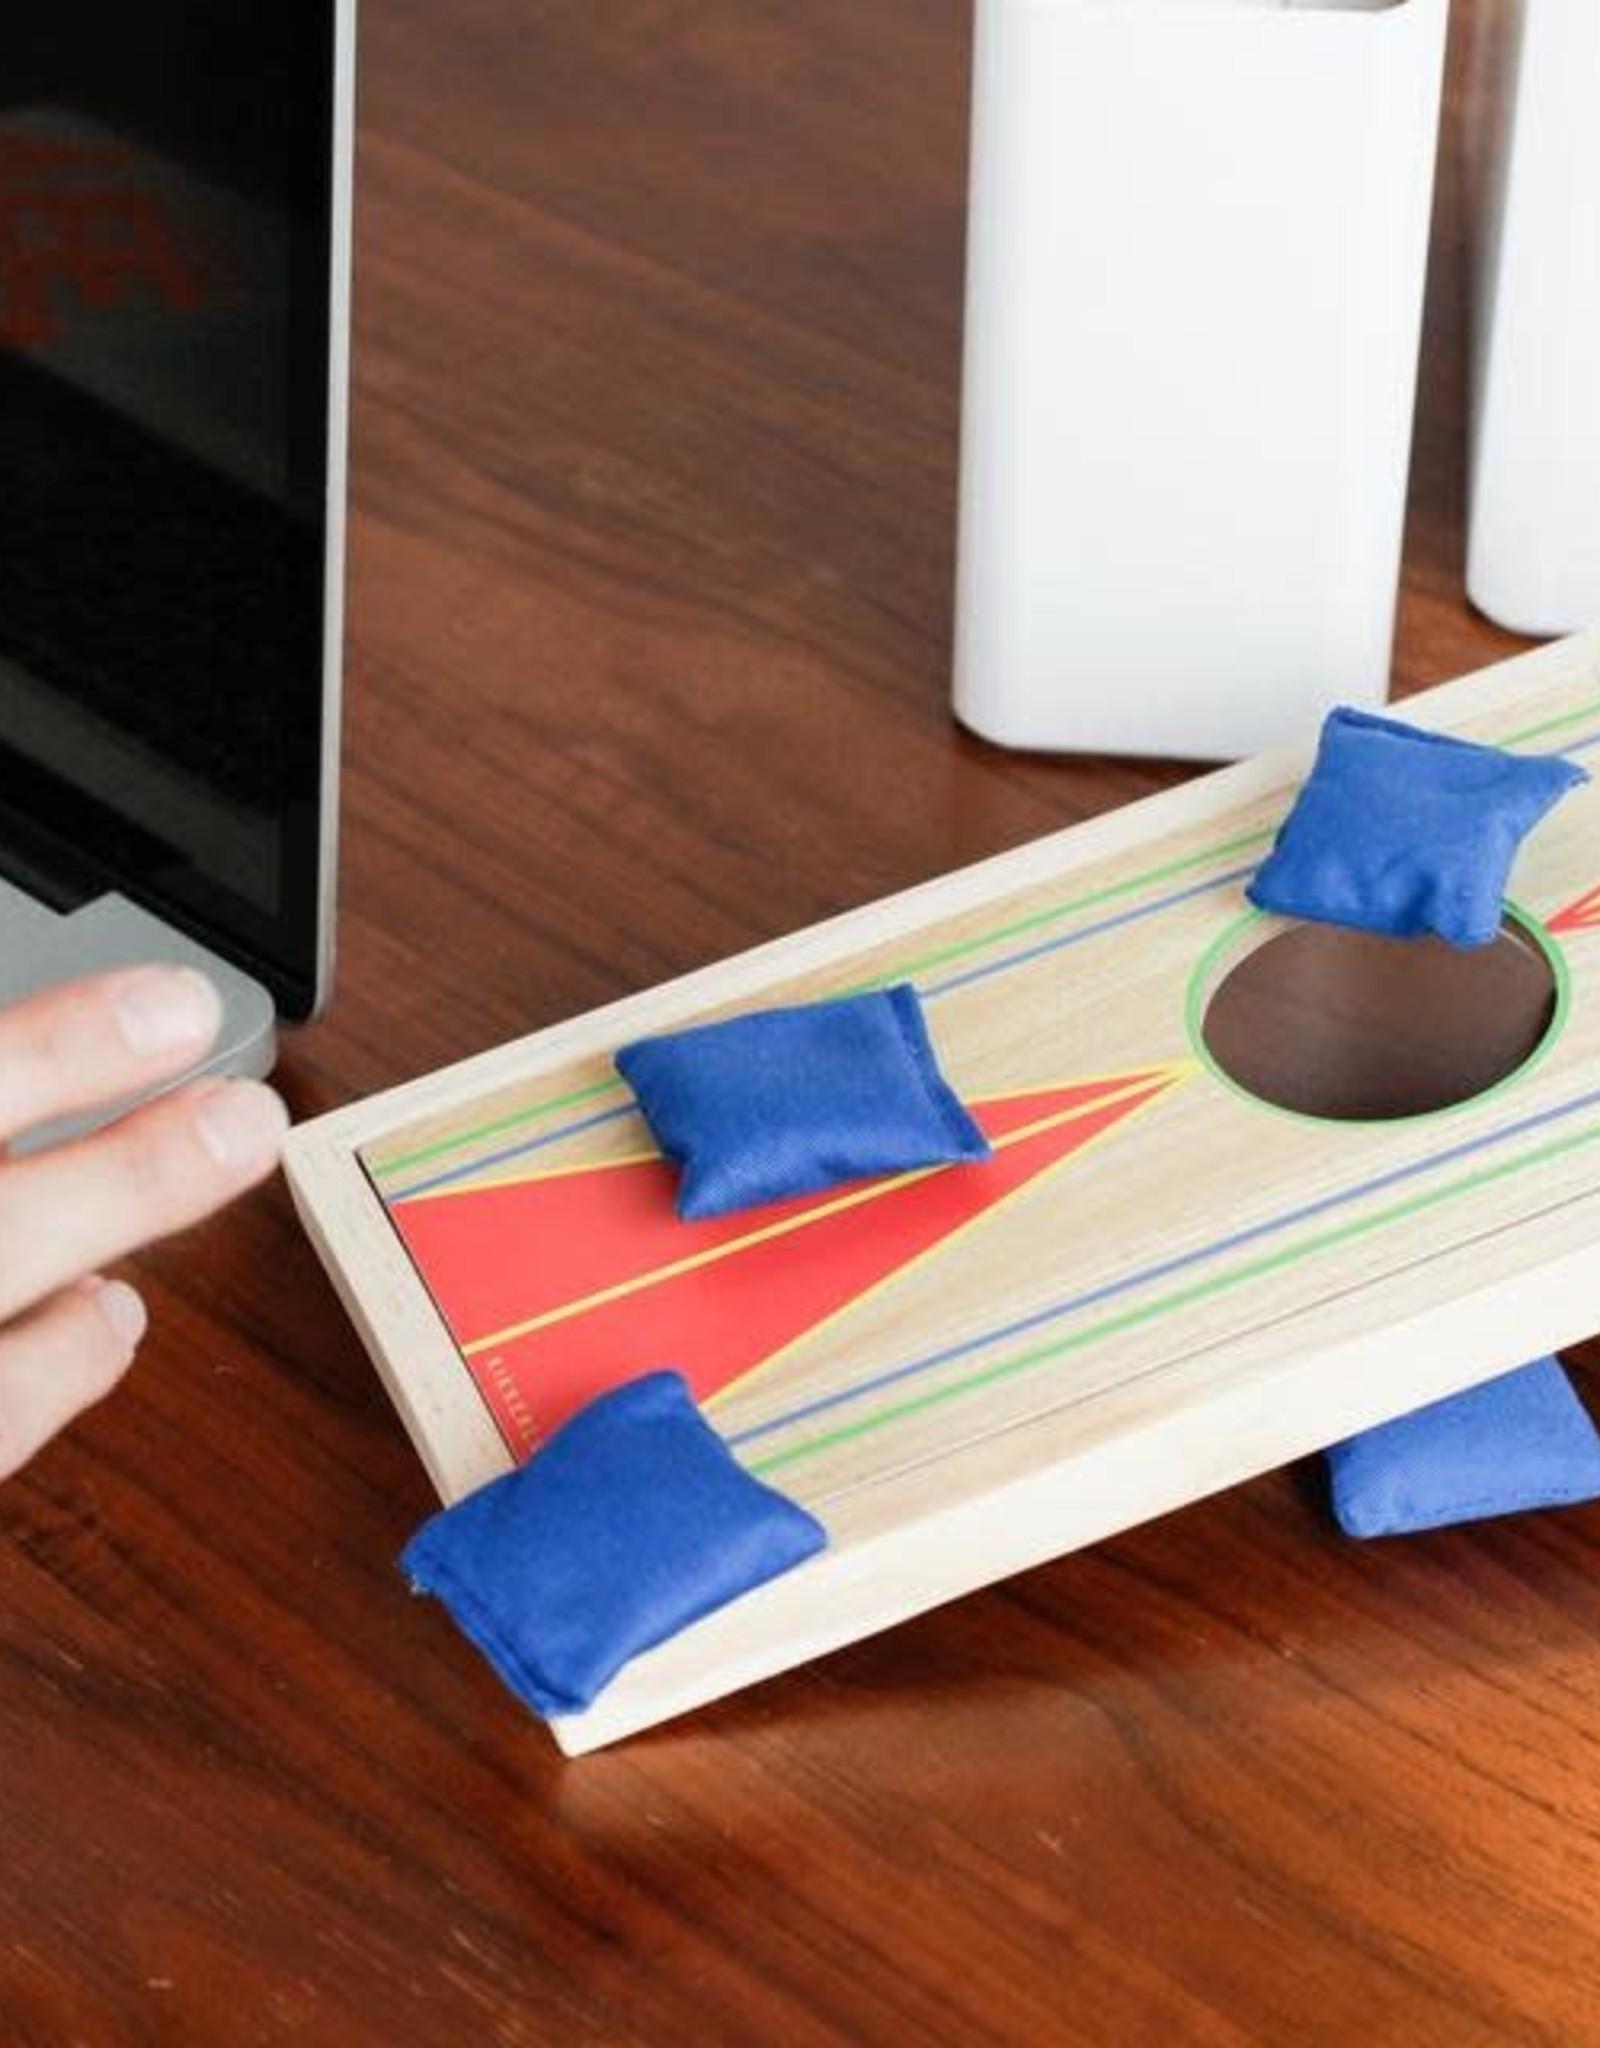 Kikkerland Desktop Cornhole Bean Bag Game